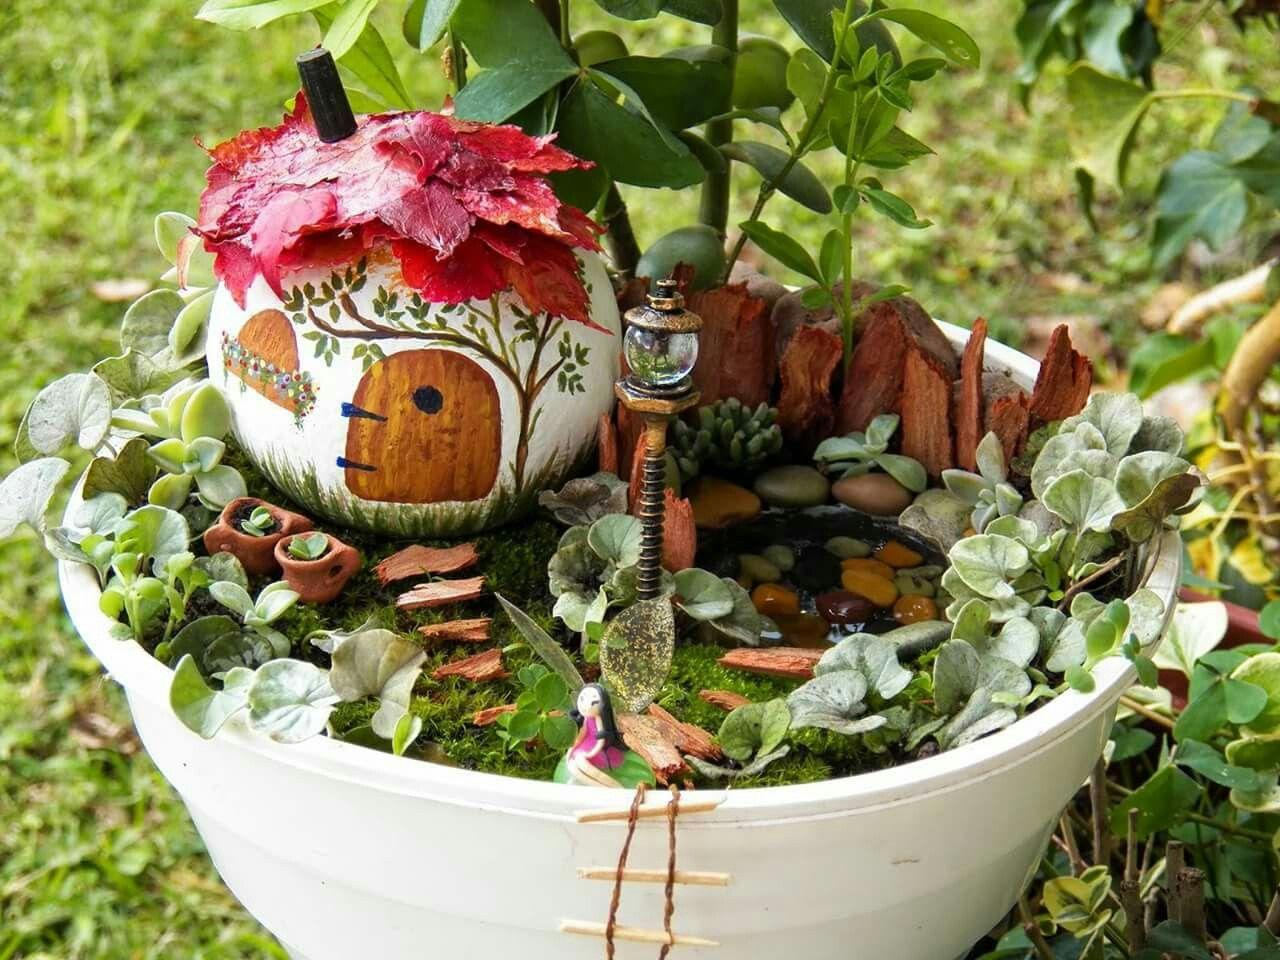 Jardines miniaturas flores naturales pinterest for Jardines japoneses en miniatura